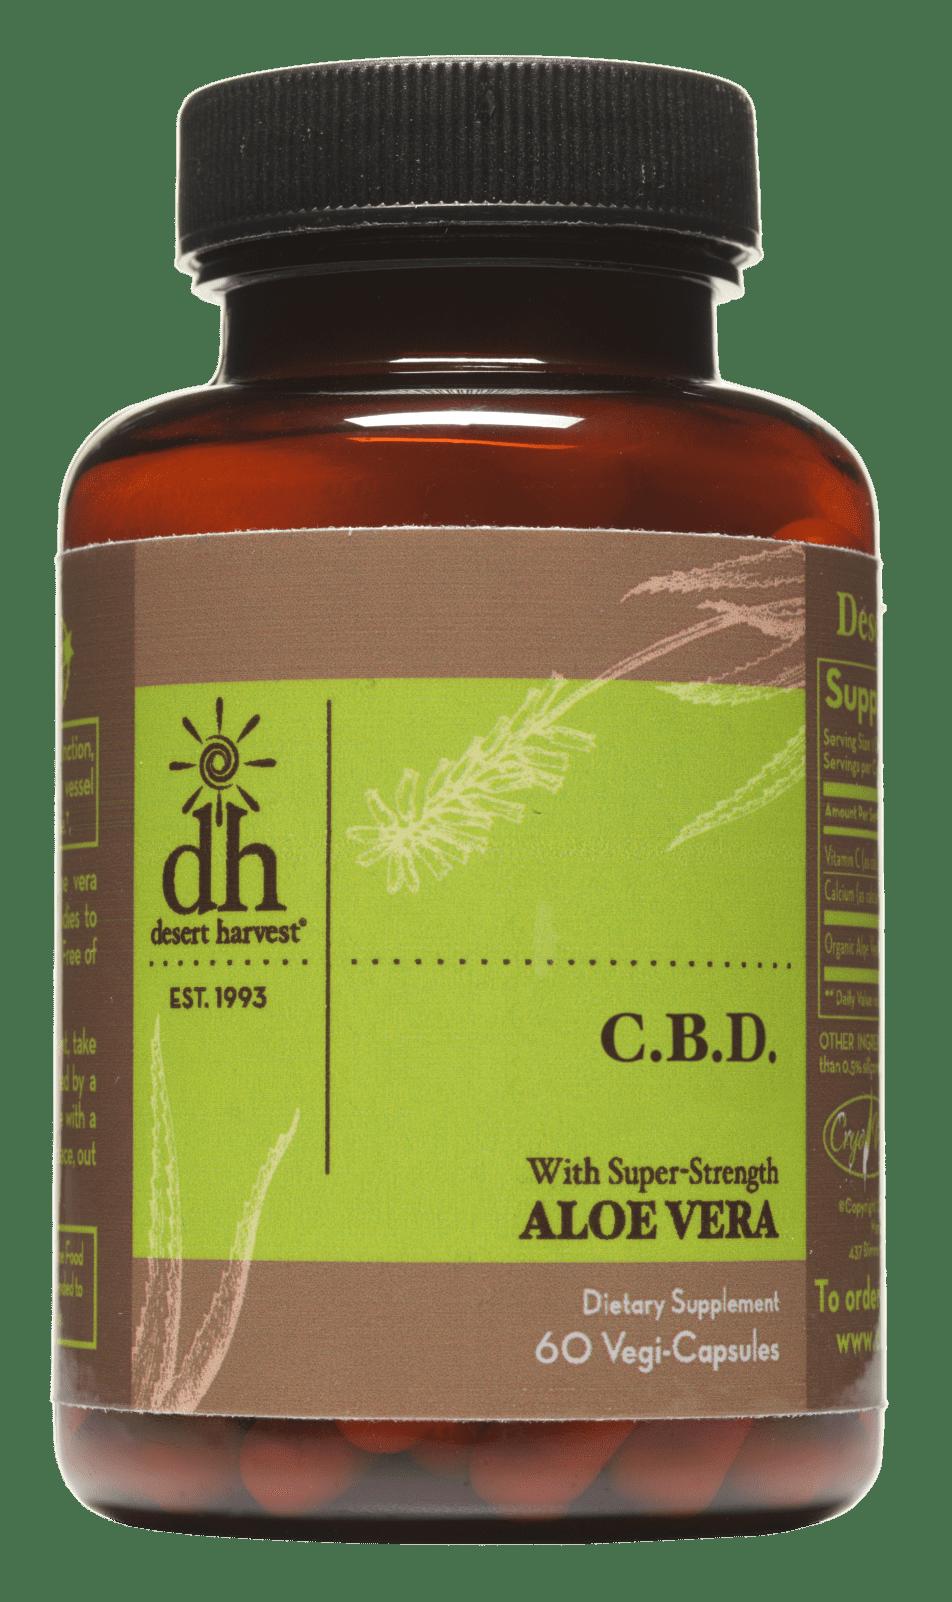 Aloe vera extract producer funds McGill CBD pain research